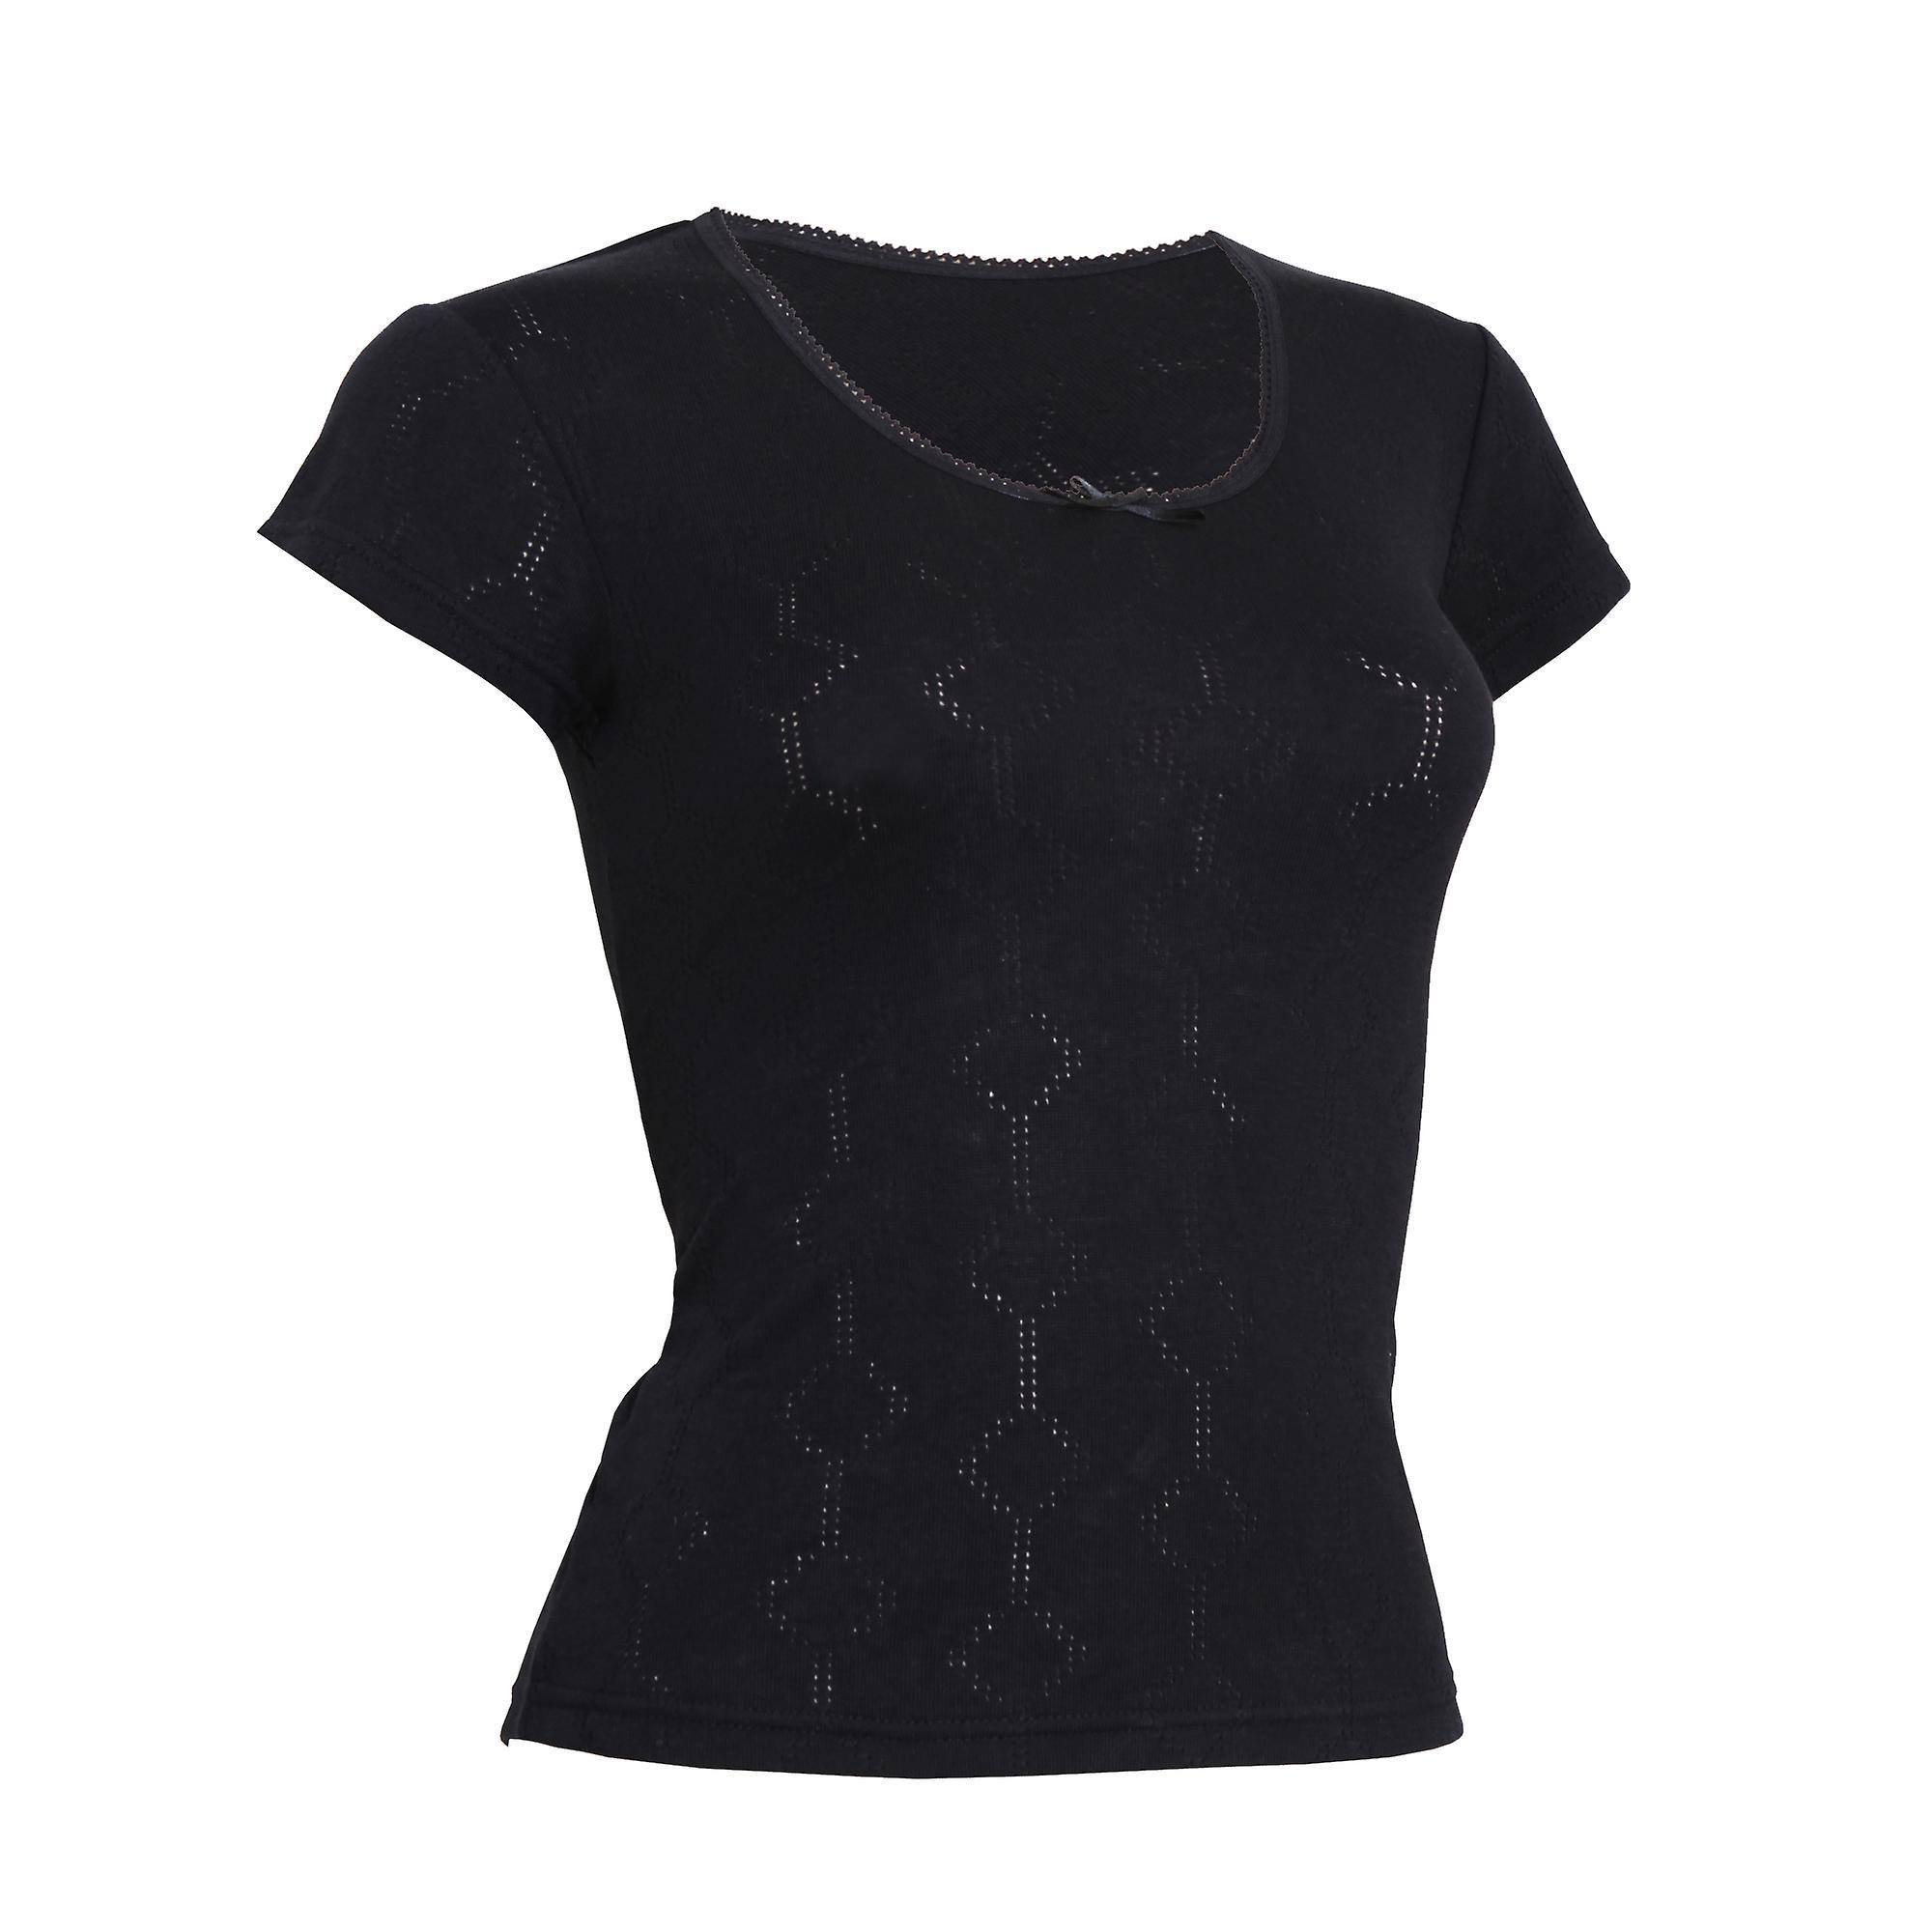 FLOSO Damen/Damen Thermo-Unterwäsche Kurzarm T-Shirt (Viskose-Premium-Reihe)